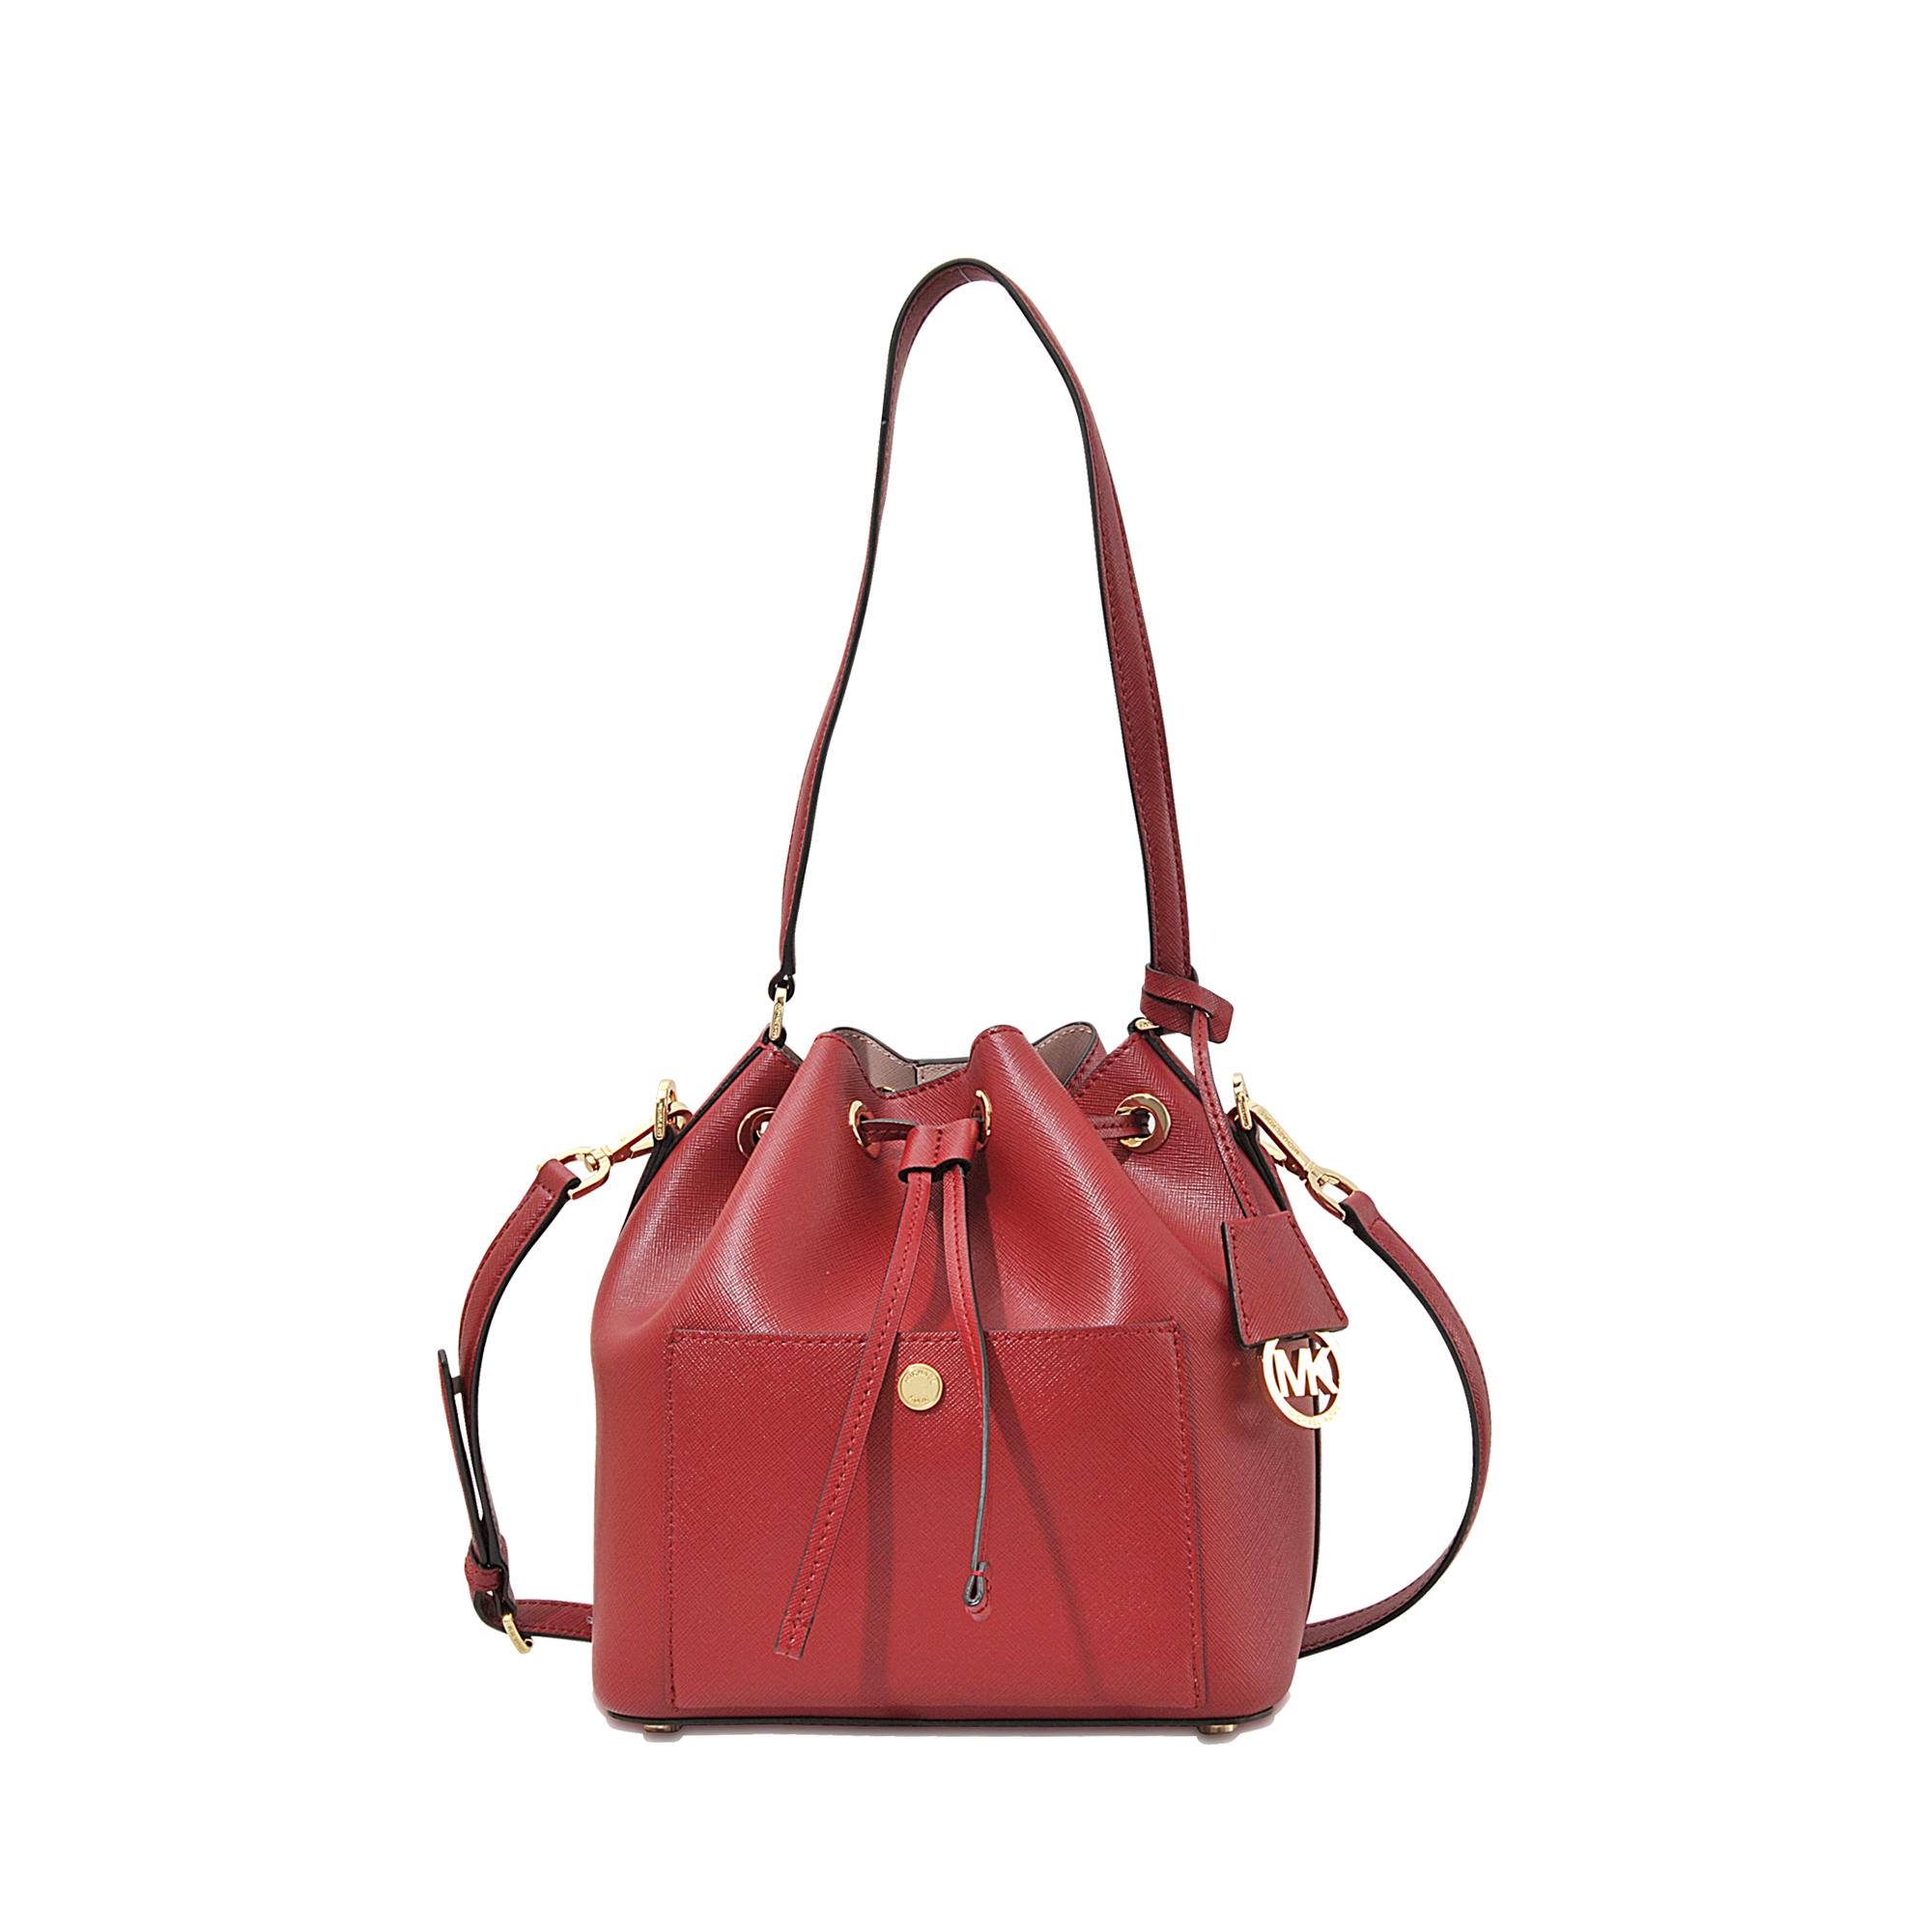 53fc22746df822 Michael Kors Red Bucket Bag On Sale | Stanford Center for ...